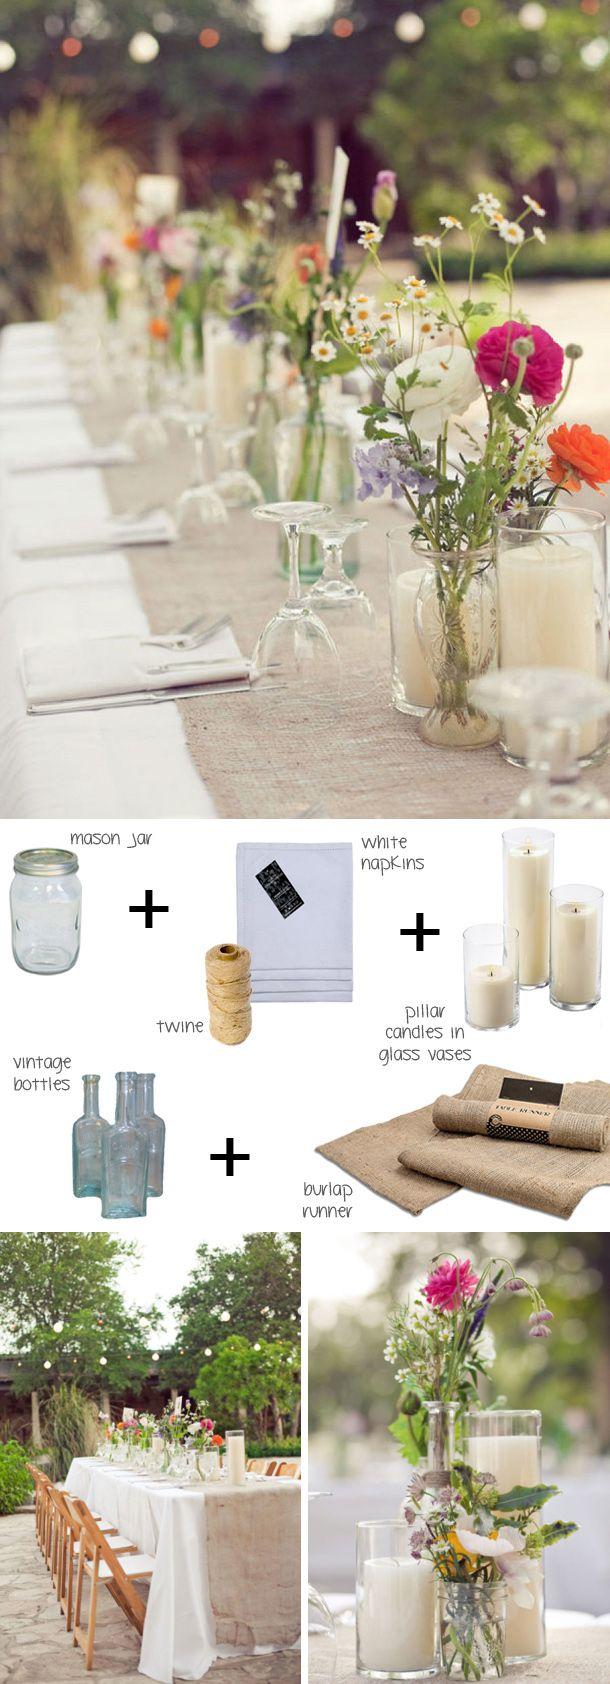 ten tables boho part 2 hochzeitsdeko pinterest. Black Bedroom Furniture Sets. Home Design Ideas